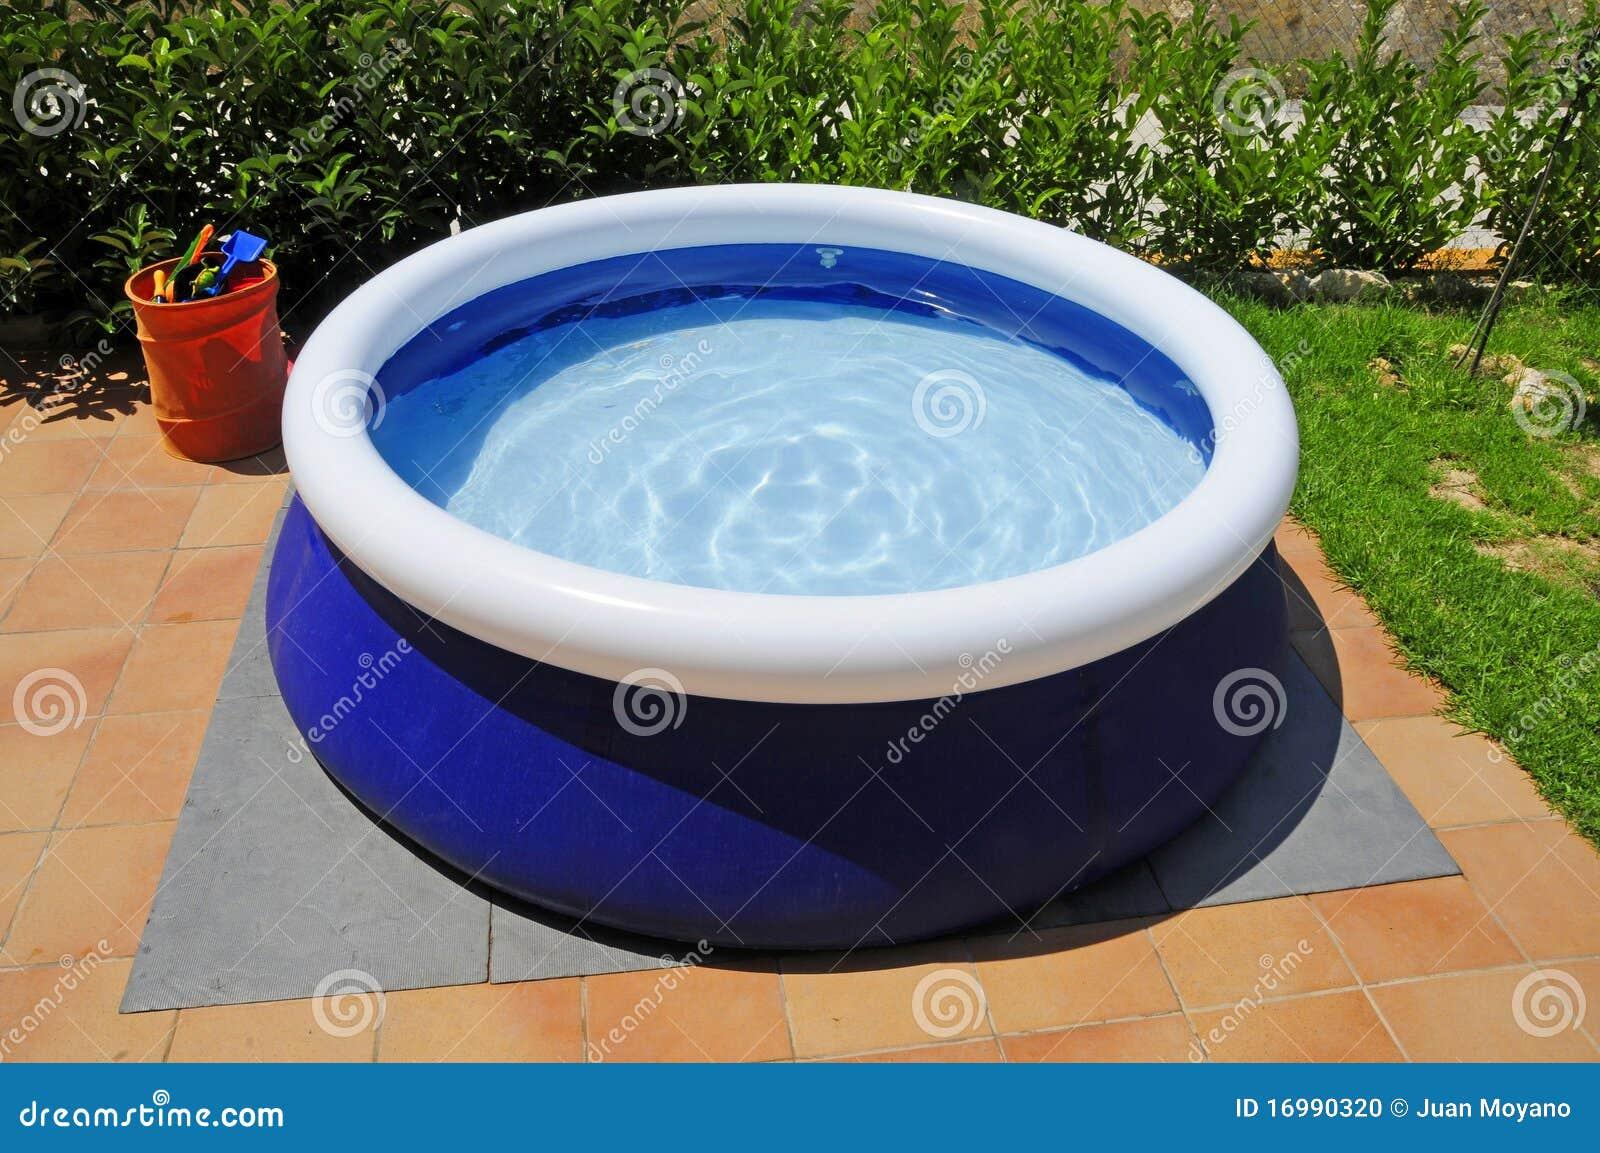 aufblasbarer swimmingpool stockfoto. bild von garten - 16990320